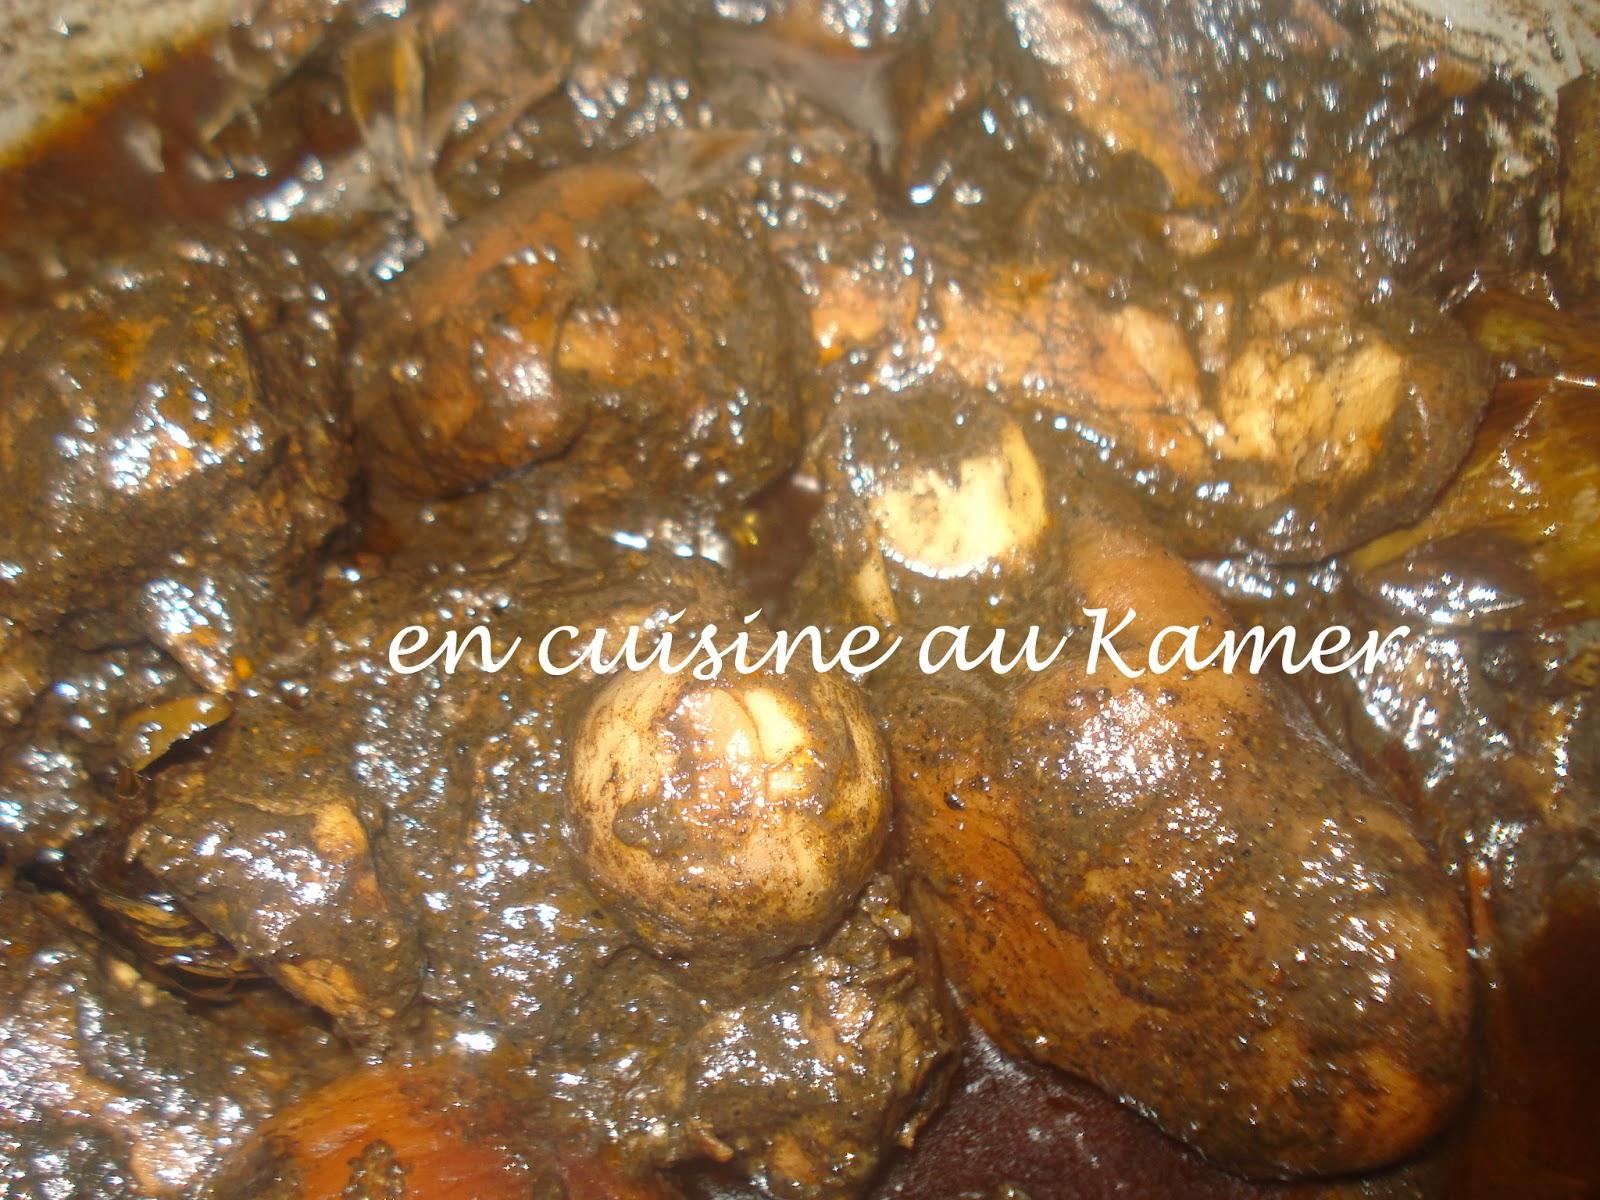 Mbongo de porc la cuisine camerounaise - Cuisine africaine camerounaise ...